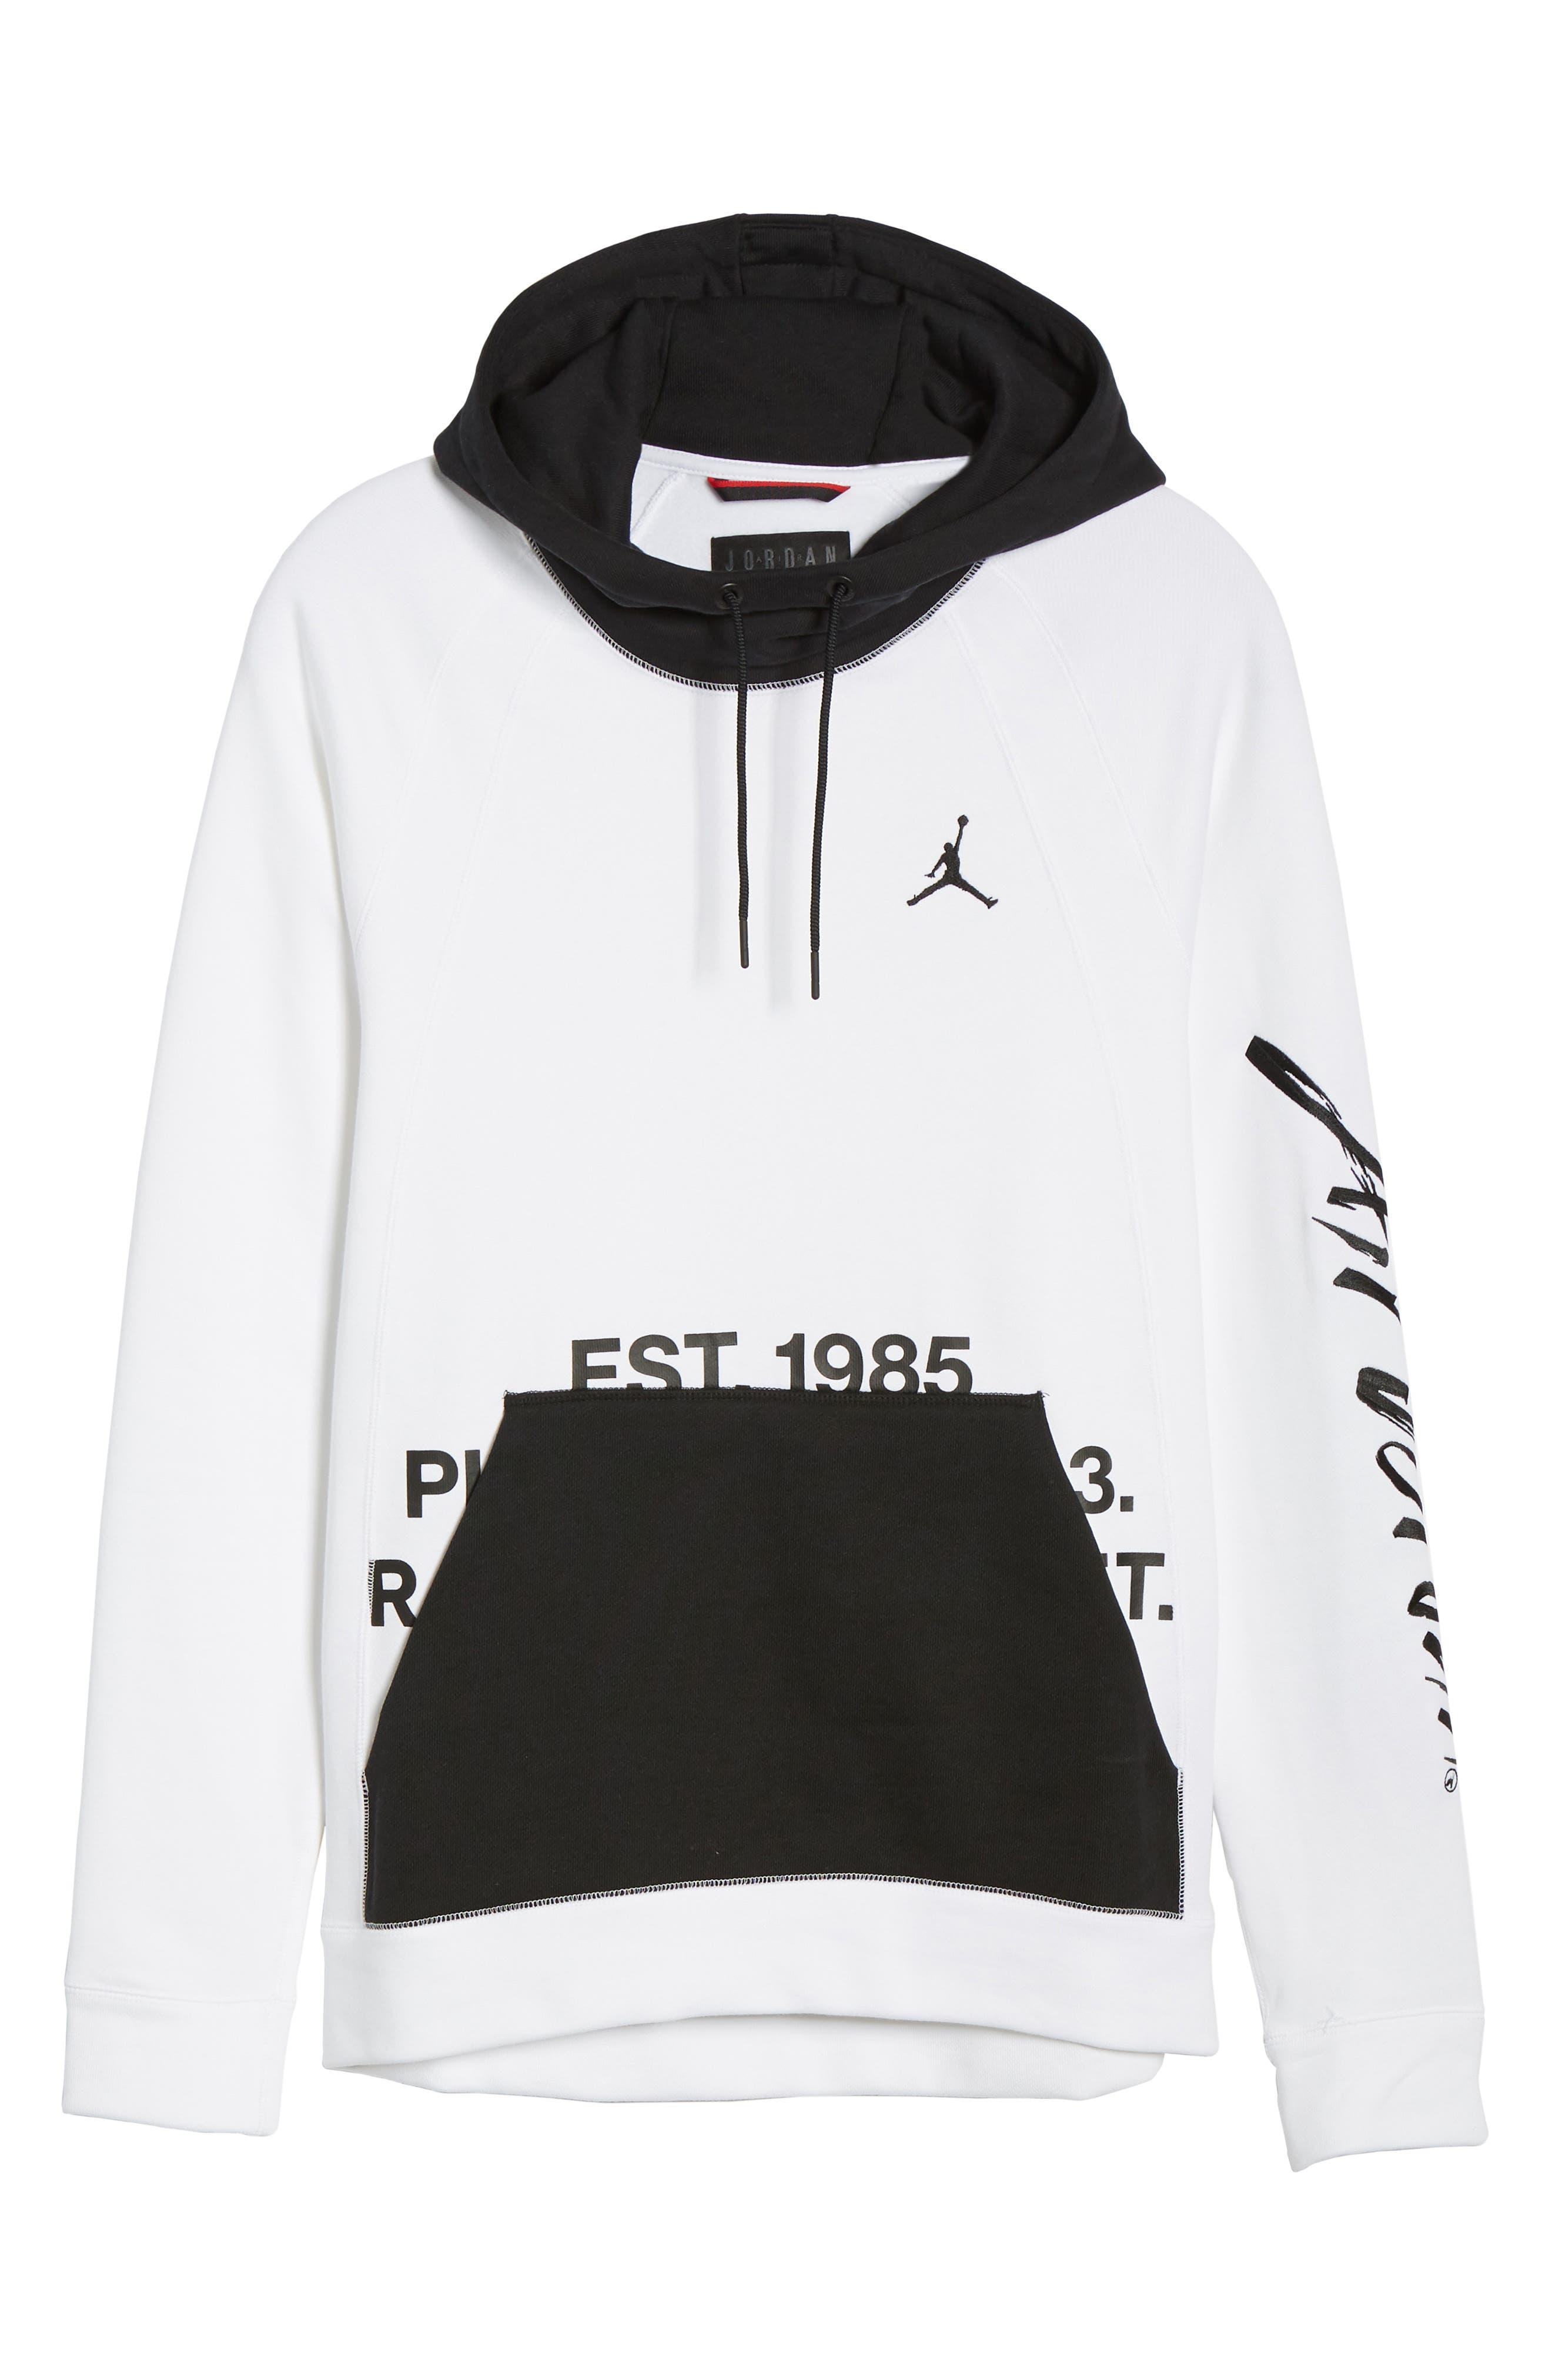 JORDAN, Sportswear Greatest Fleece Pullover Hoodie, Alternate thumbnail 7, color, WHITE/ BLACK